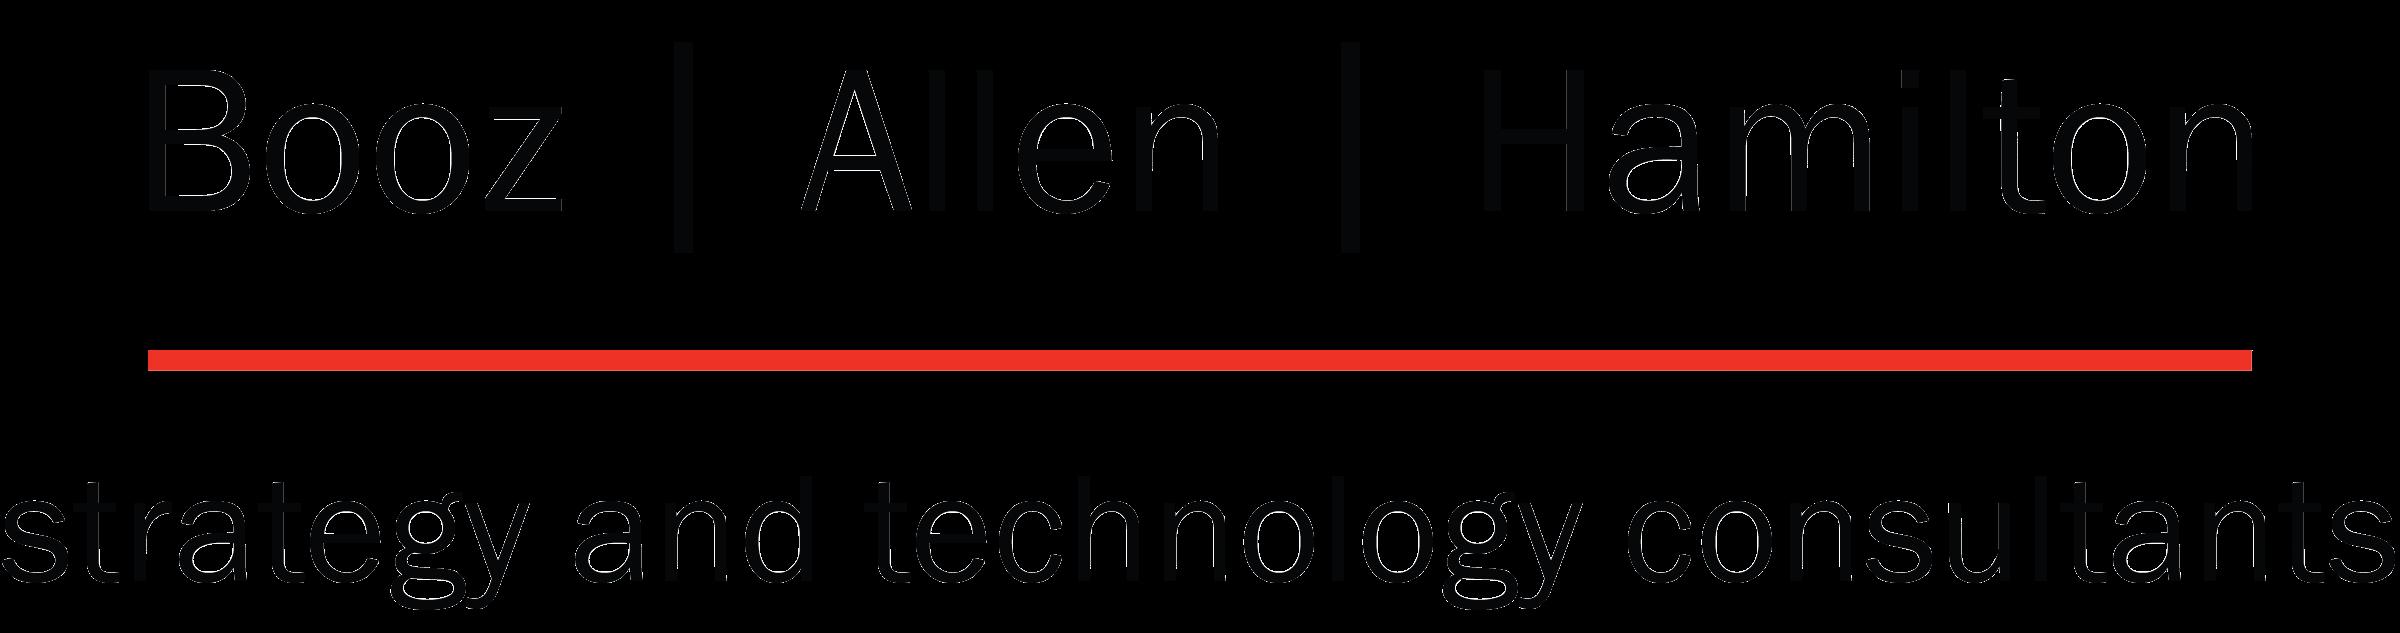 booz_allen_logo_tagline_black.png